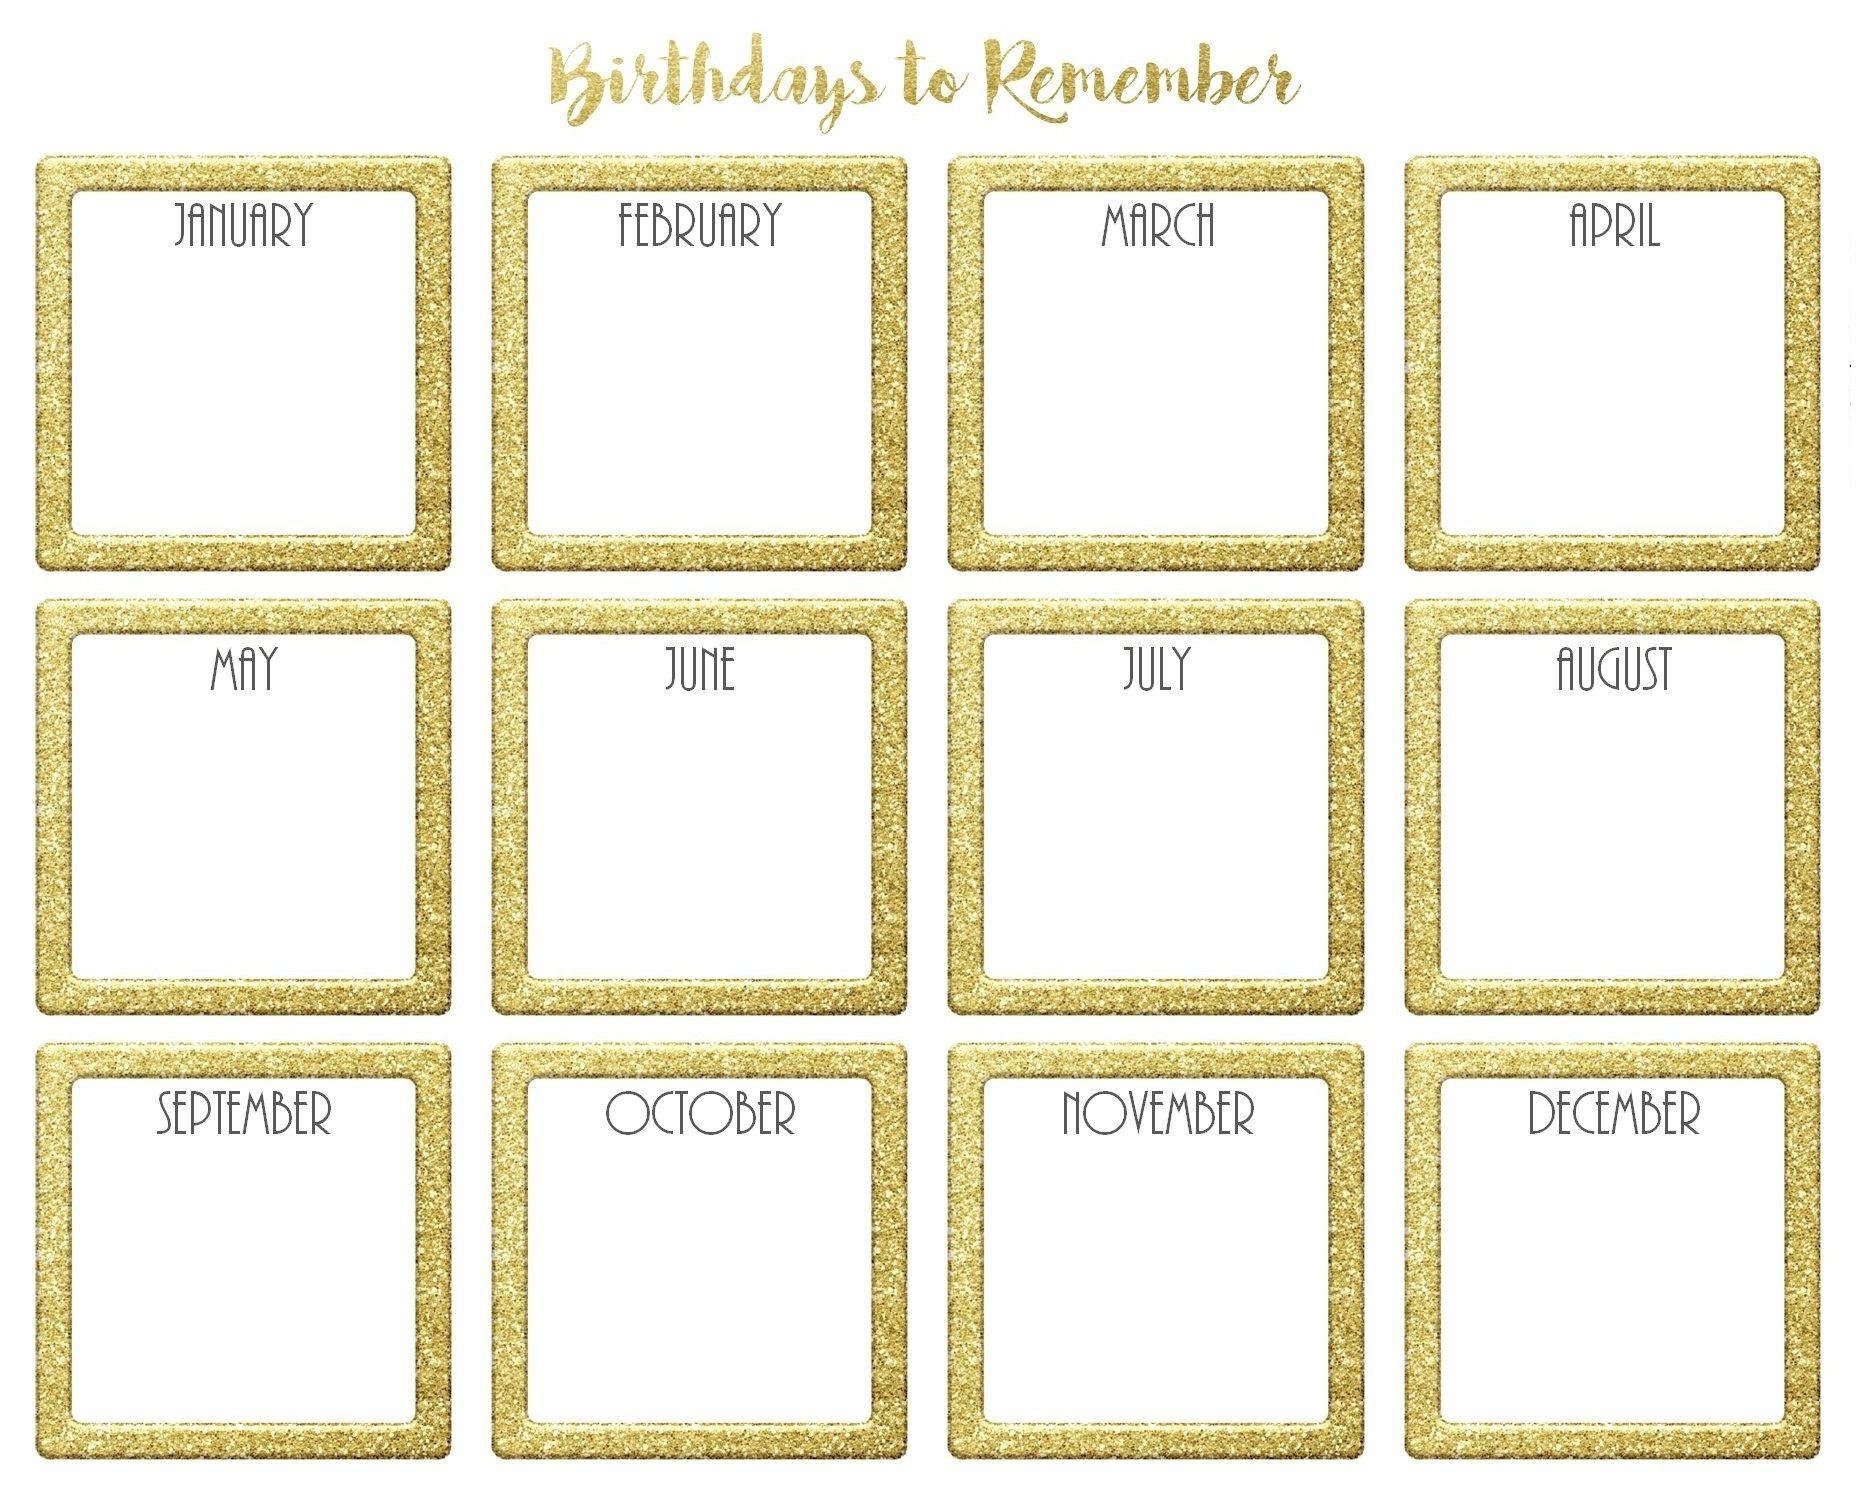 Birthday Calendar Template Free Microsoft Word